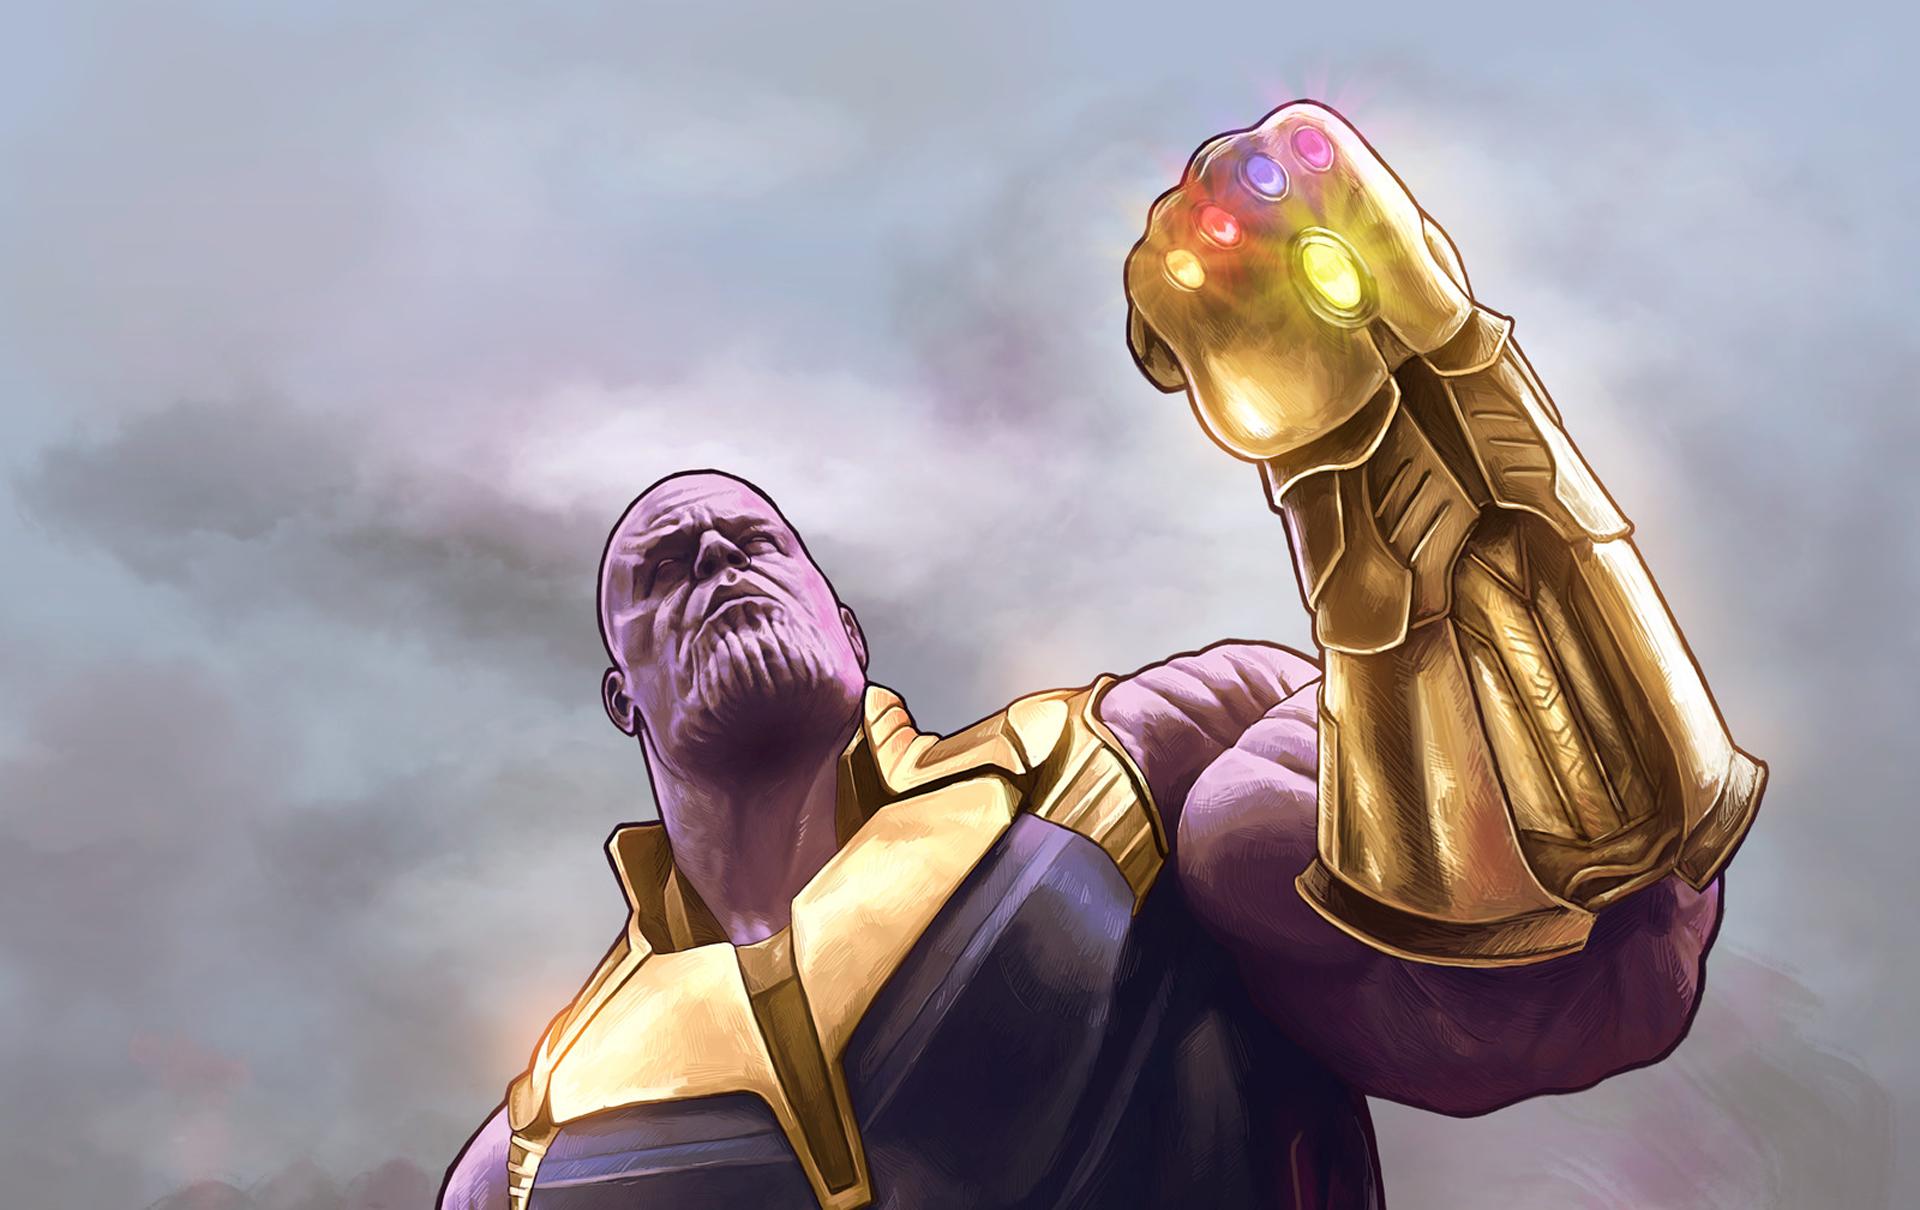 Thanos Infinity Gauntlet HD, HD Superheroes, 4k Wallpapers ... Thanos Infinity Gauntlet Movie